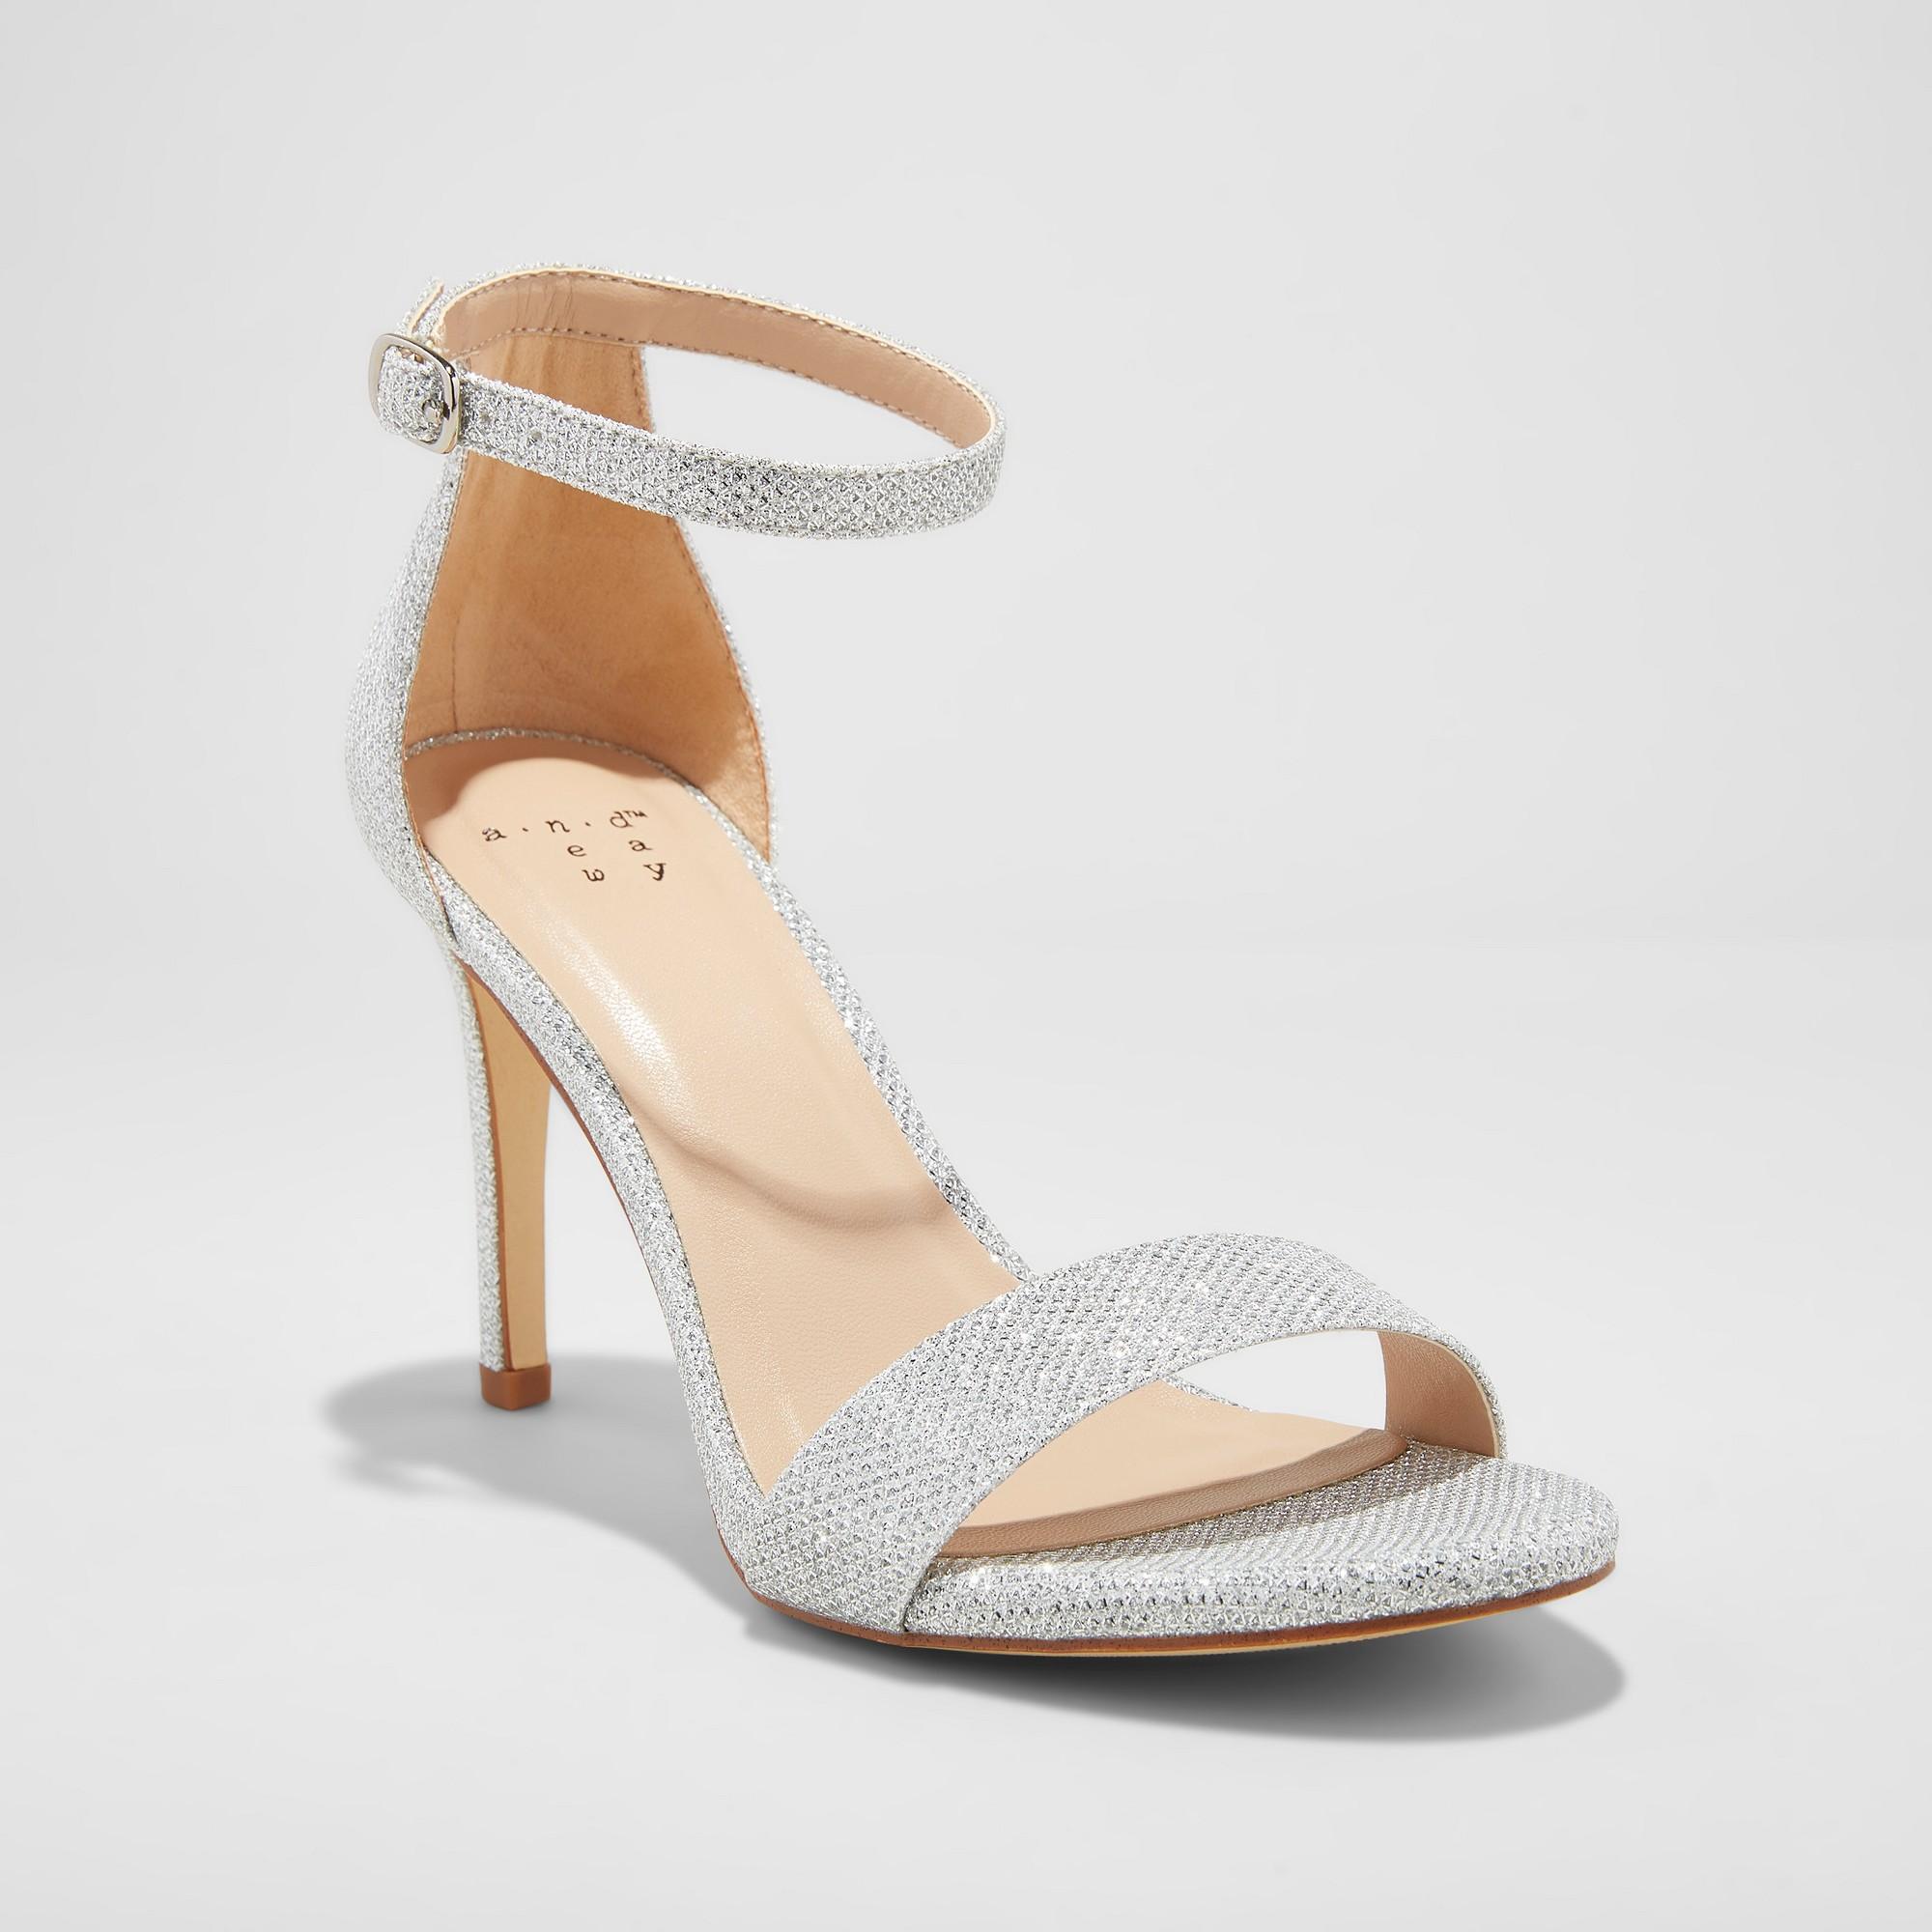 59ad48a6061 Women's Myla Satin Shimmer Stiletto Pump Heel Sandal - A New Day ...